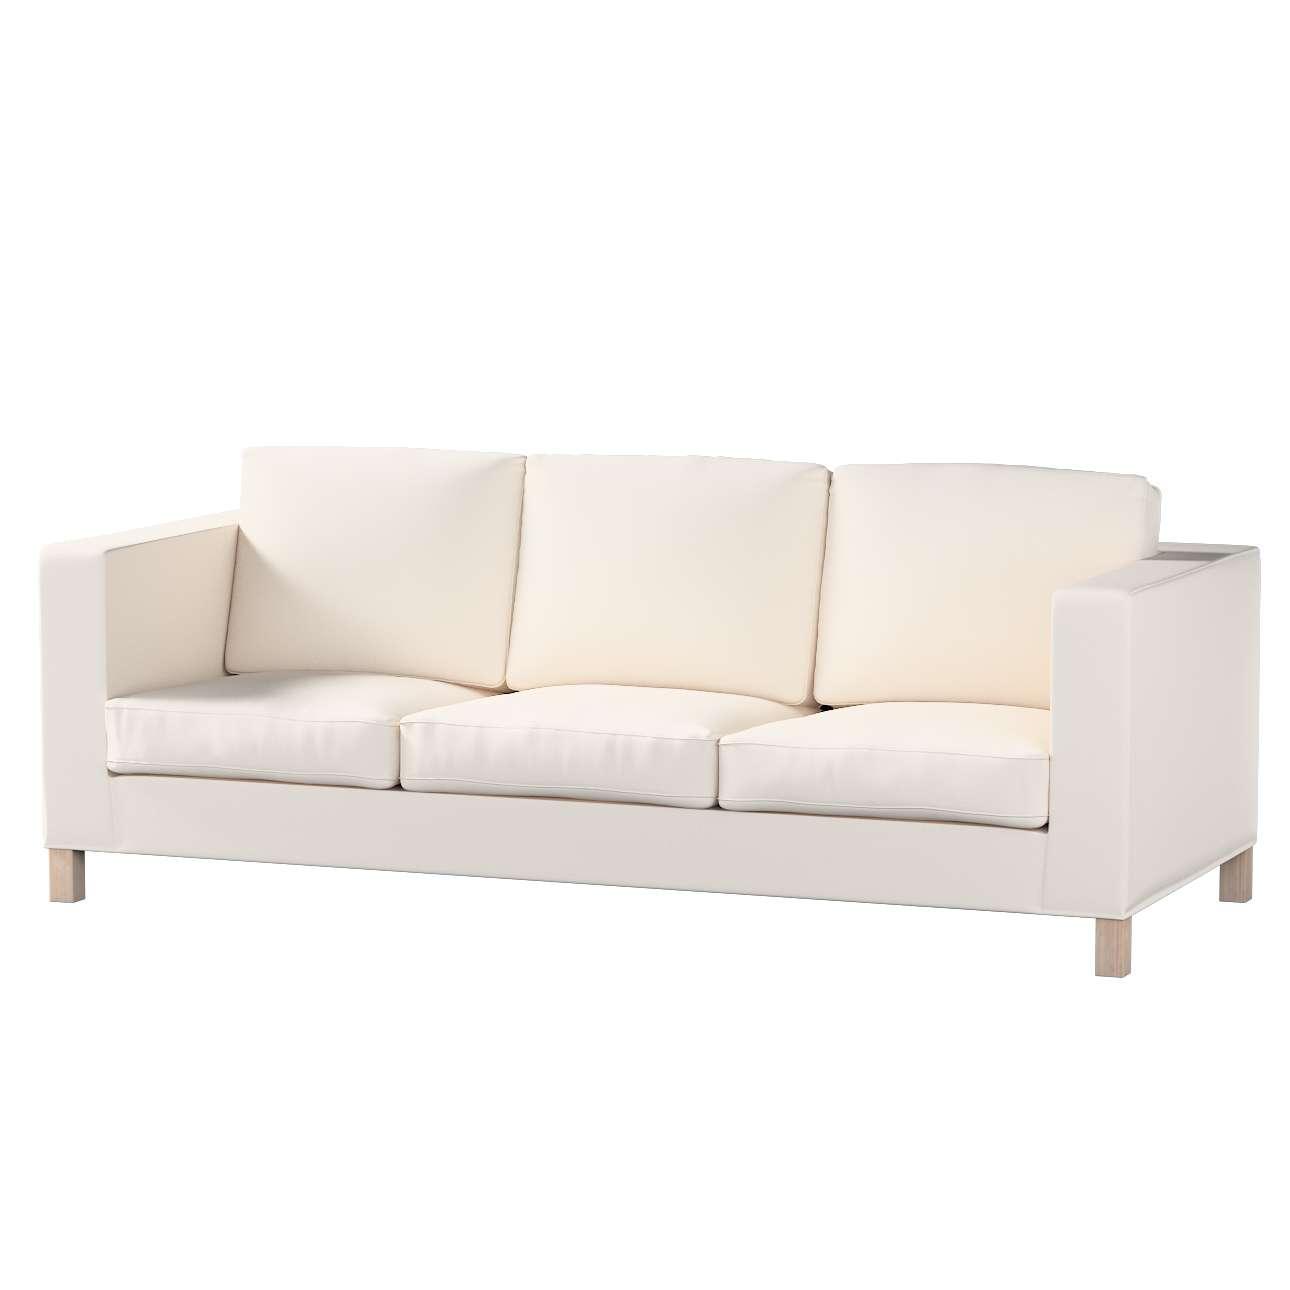 ikea karlstad sofa covers uk big chair - dekoria.co.uk